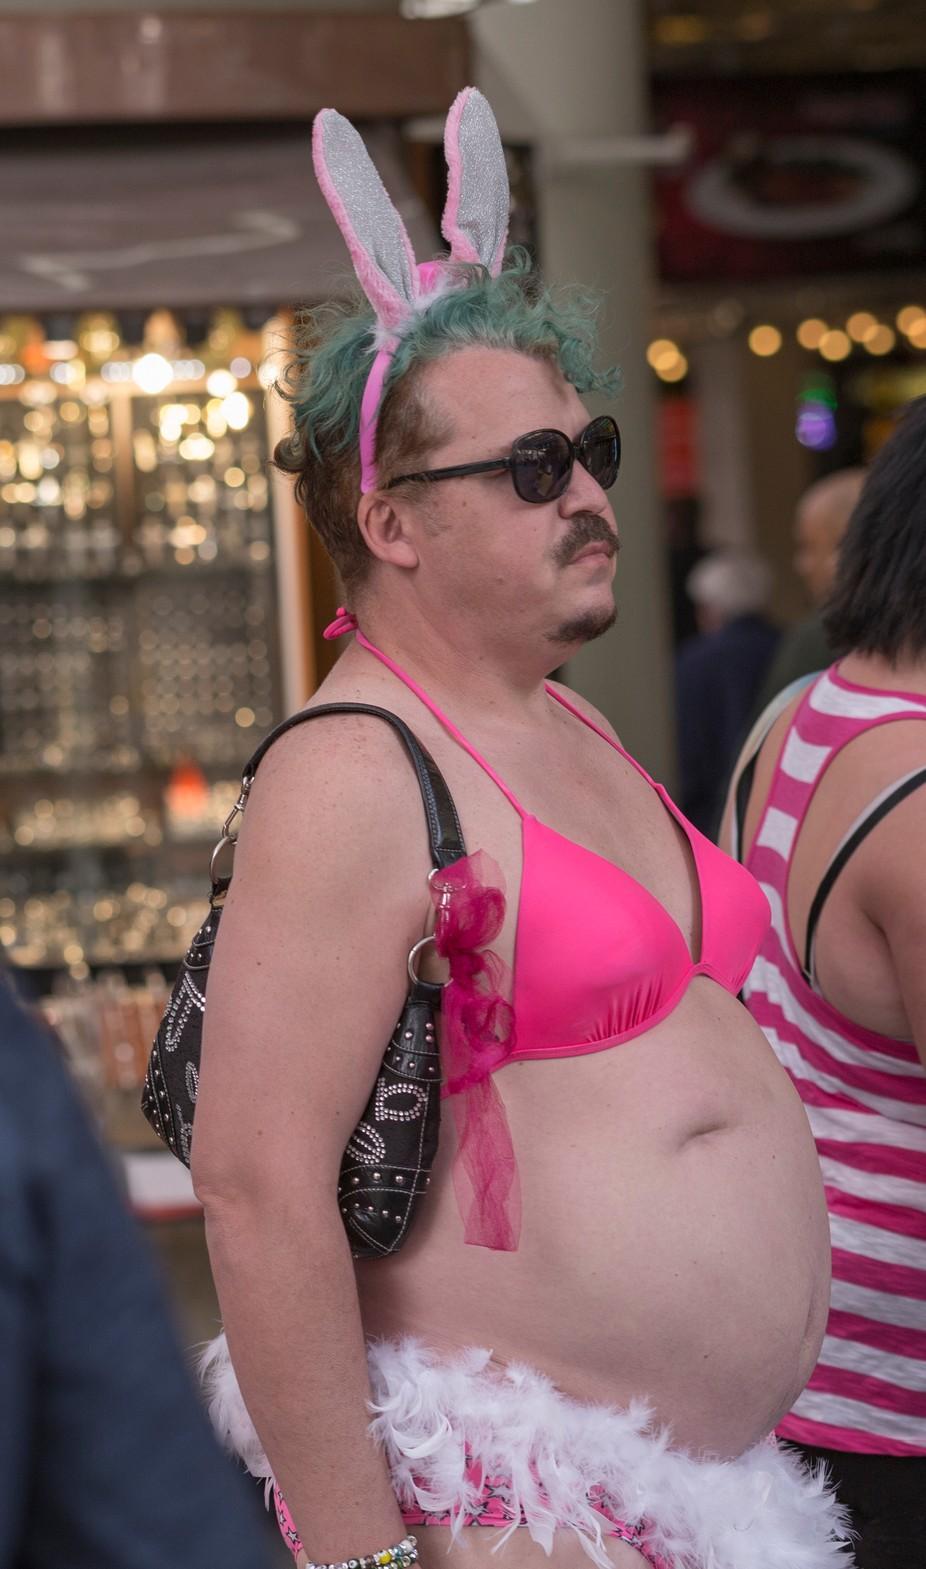 Crazy Vegas Peeps 1 - man bra